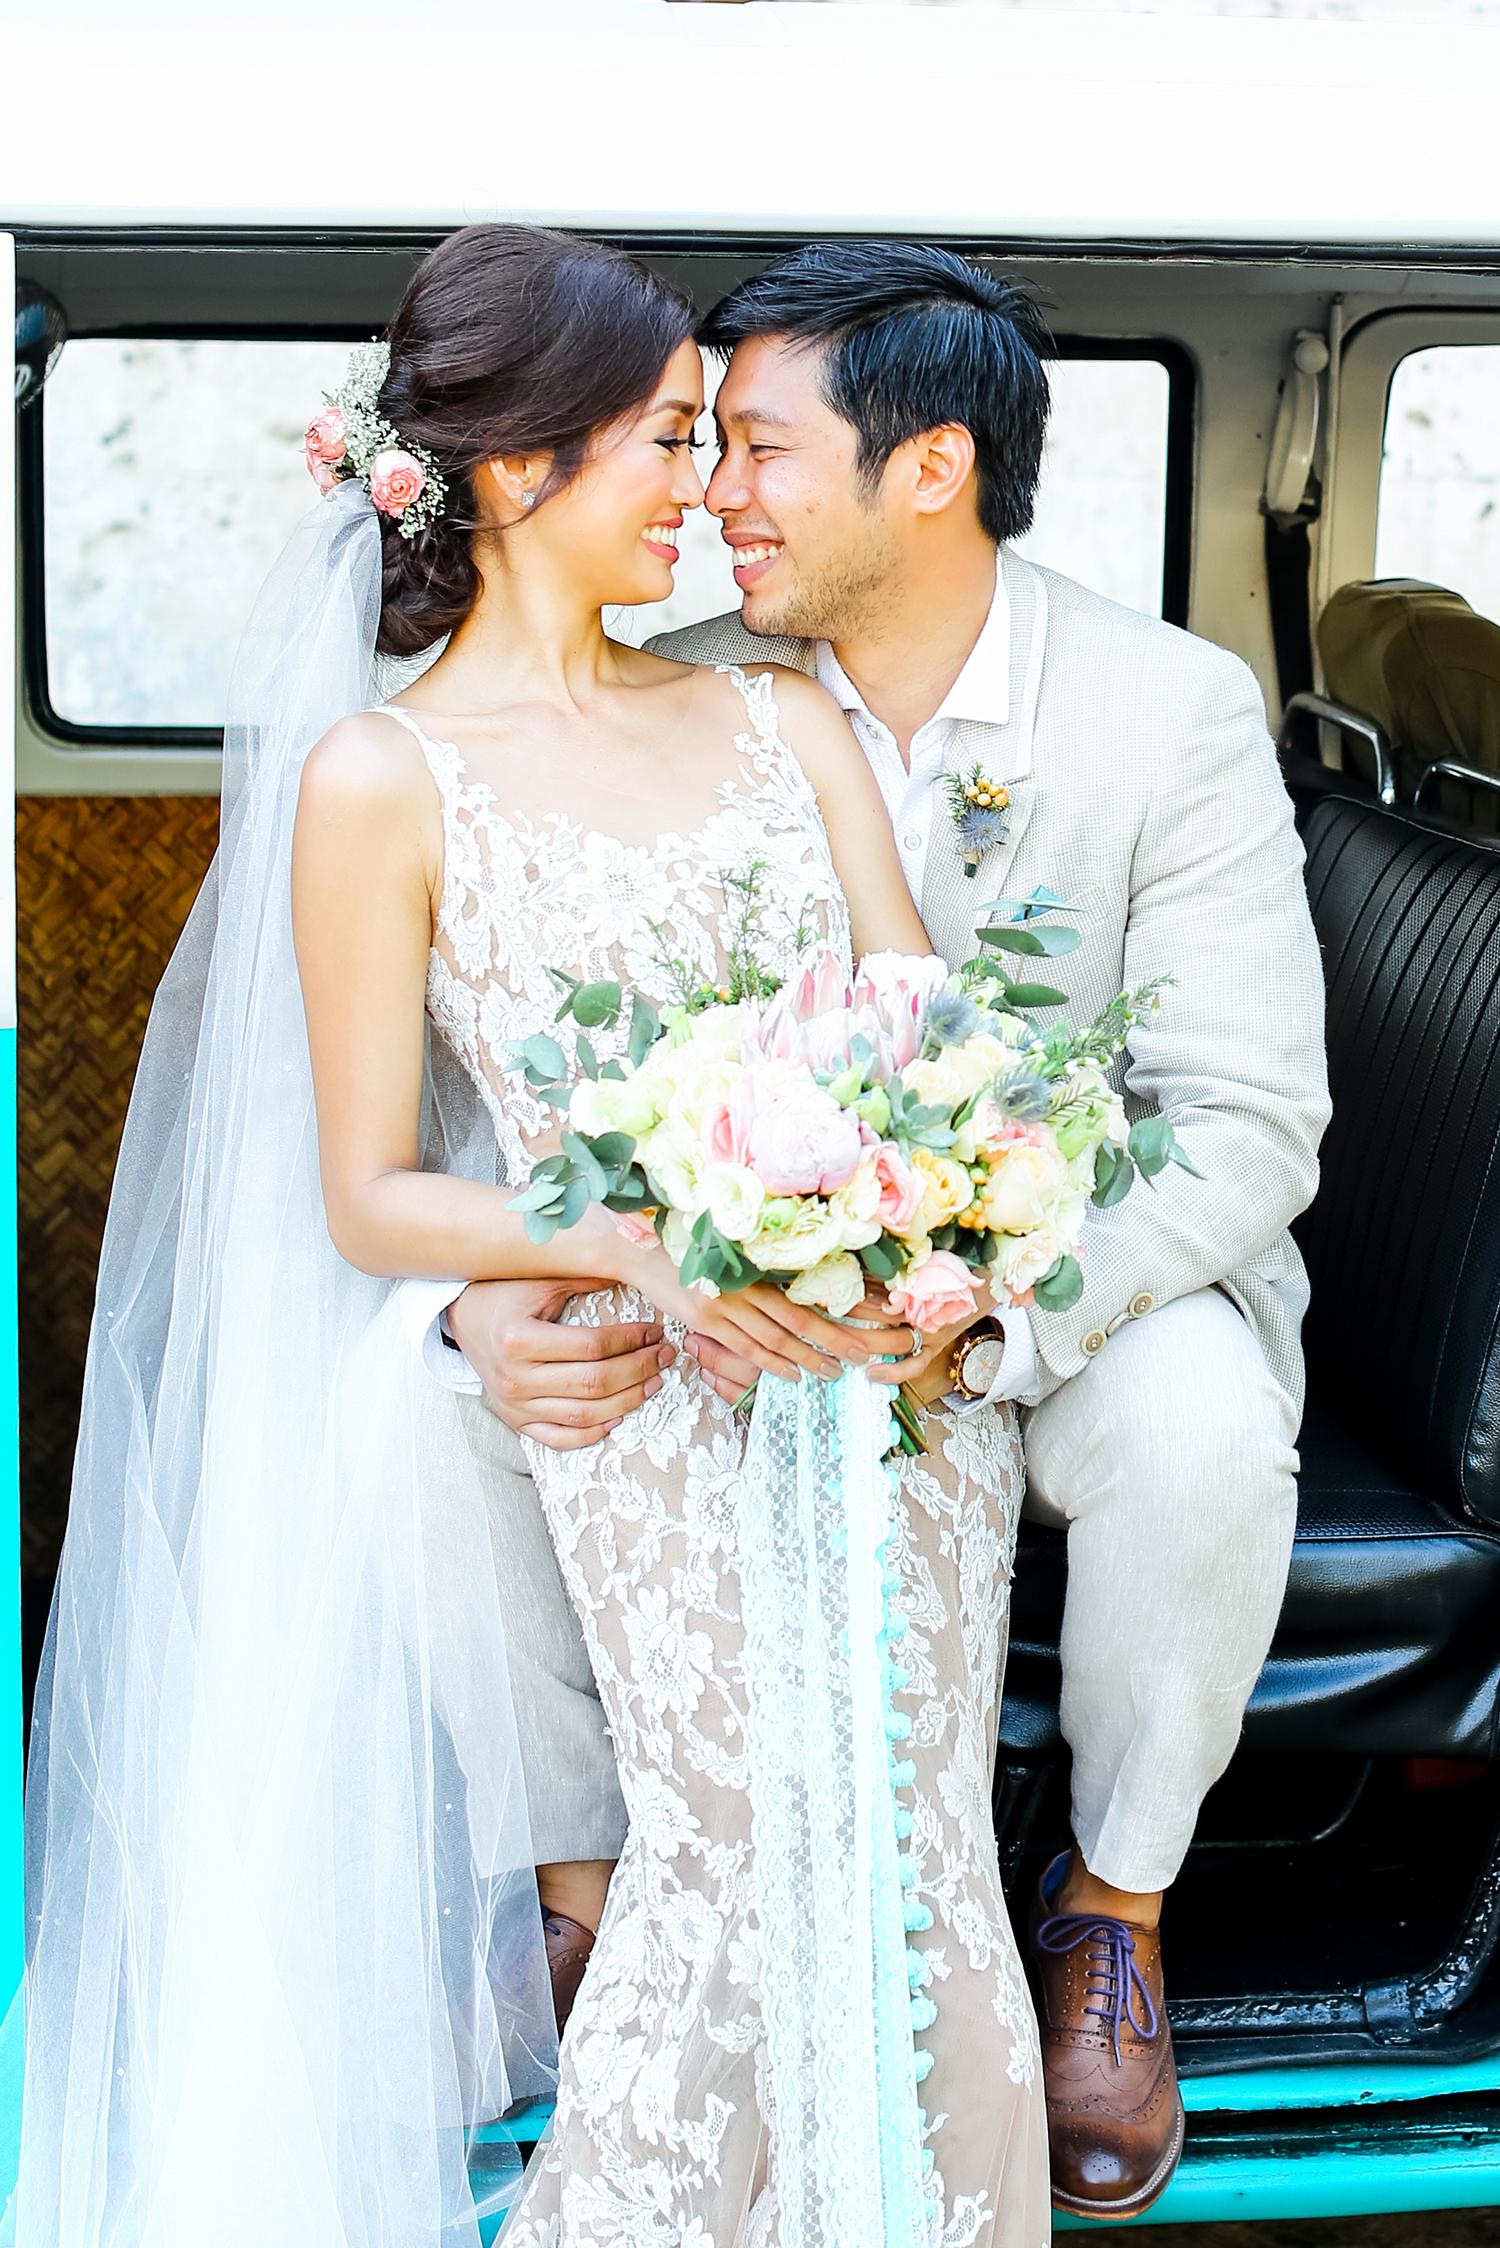 amazing-beach-wedding-in-the-philippines-by-feliz-iza-photography-9